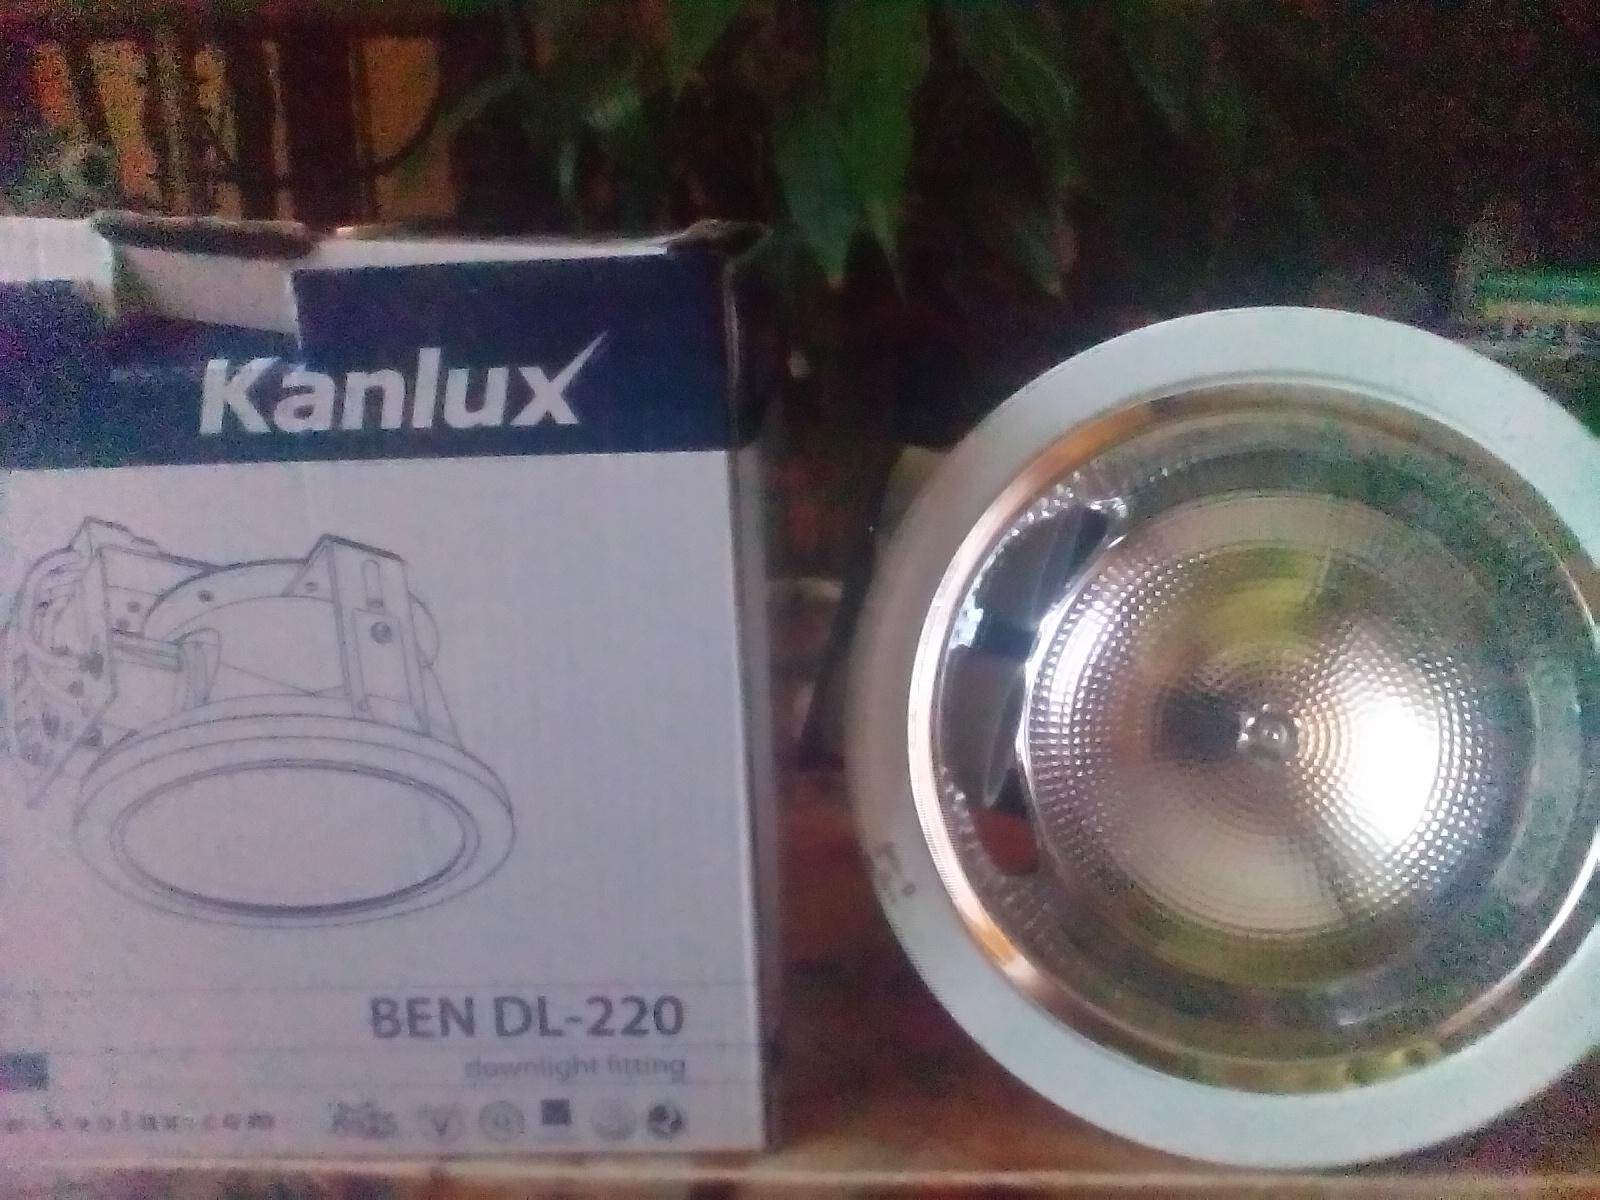 Svietidlo kanlux - Obrázok č. 2